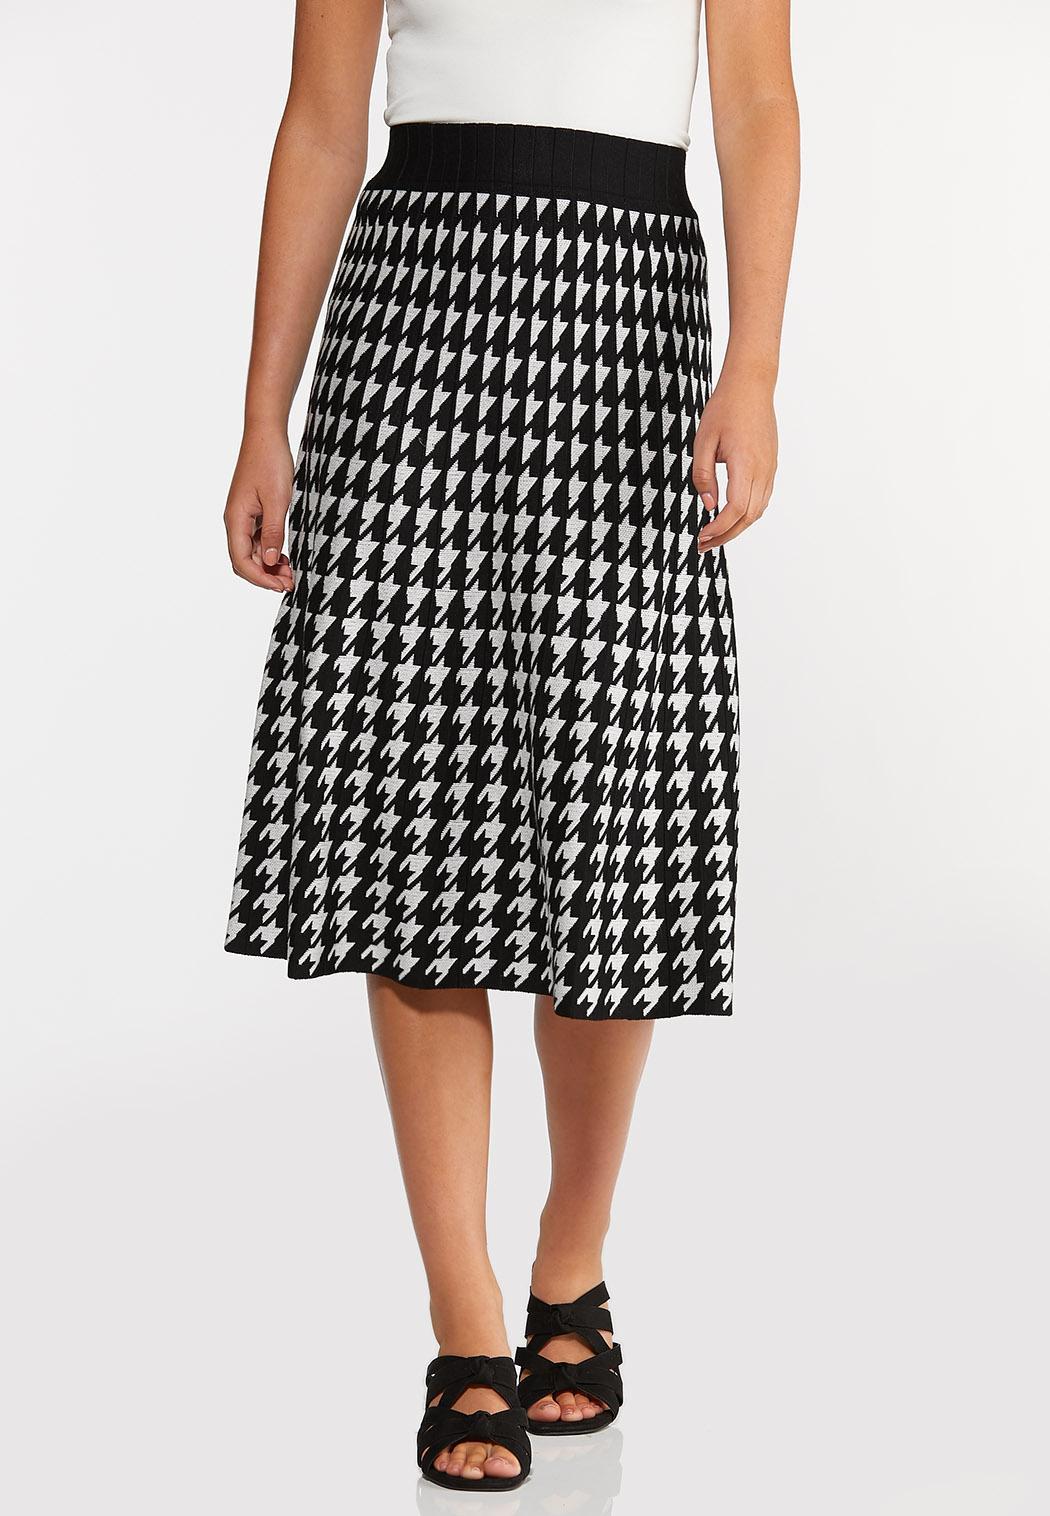 Houndstooth Sweater Skirt